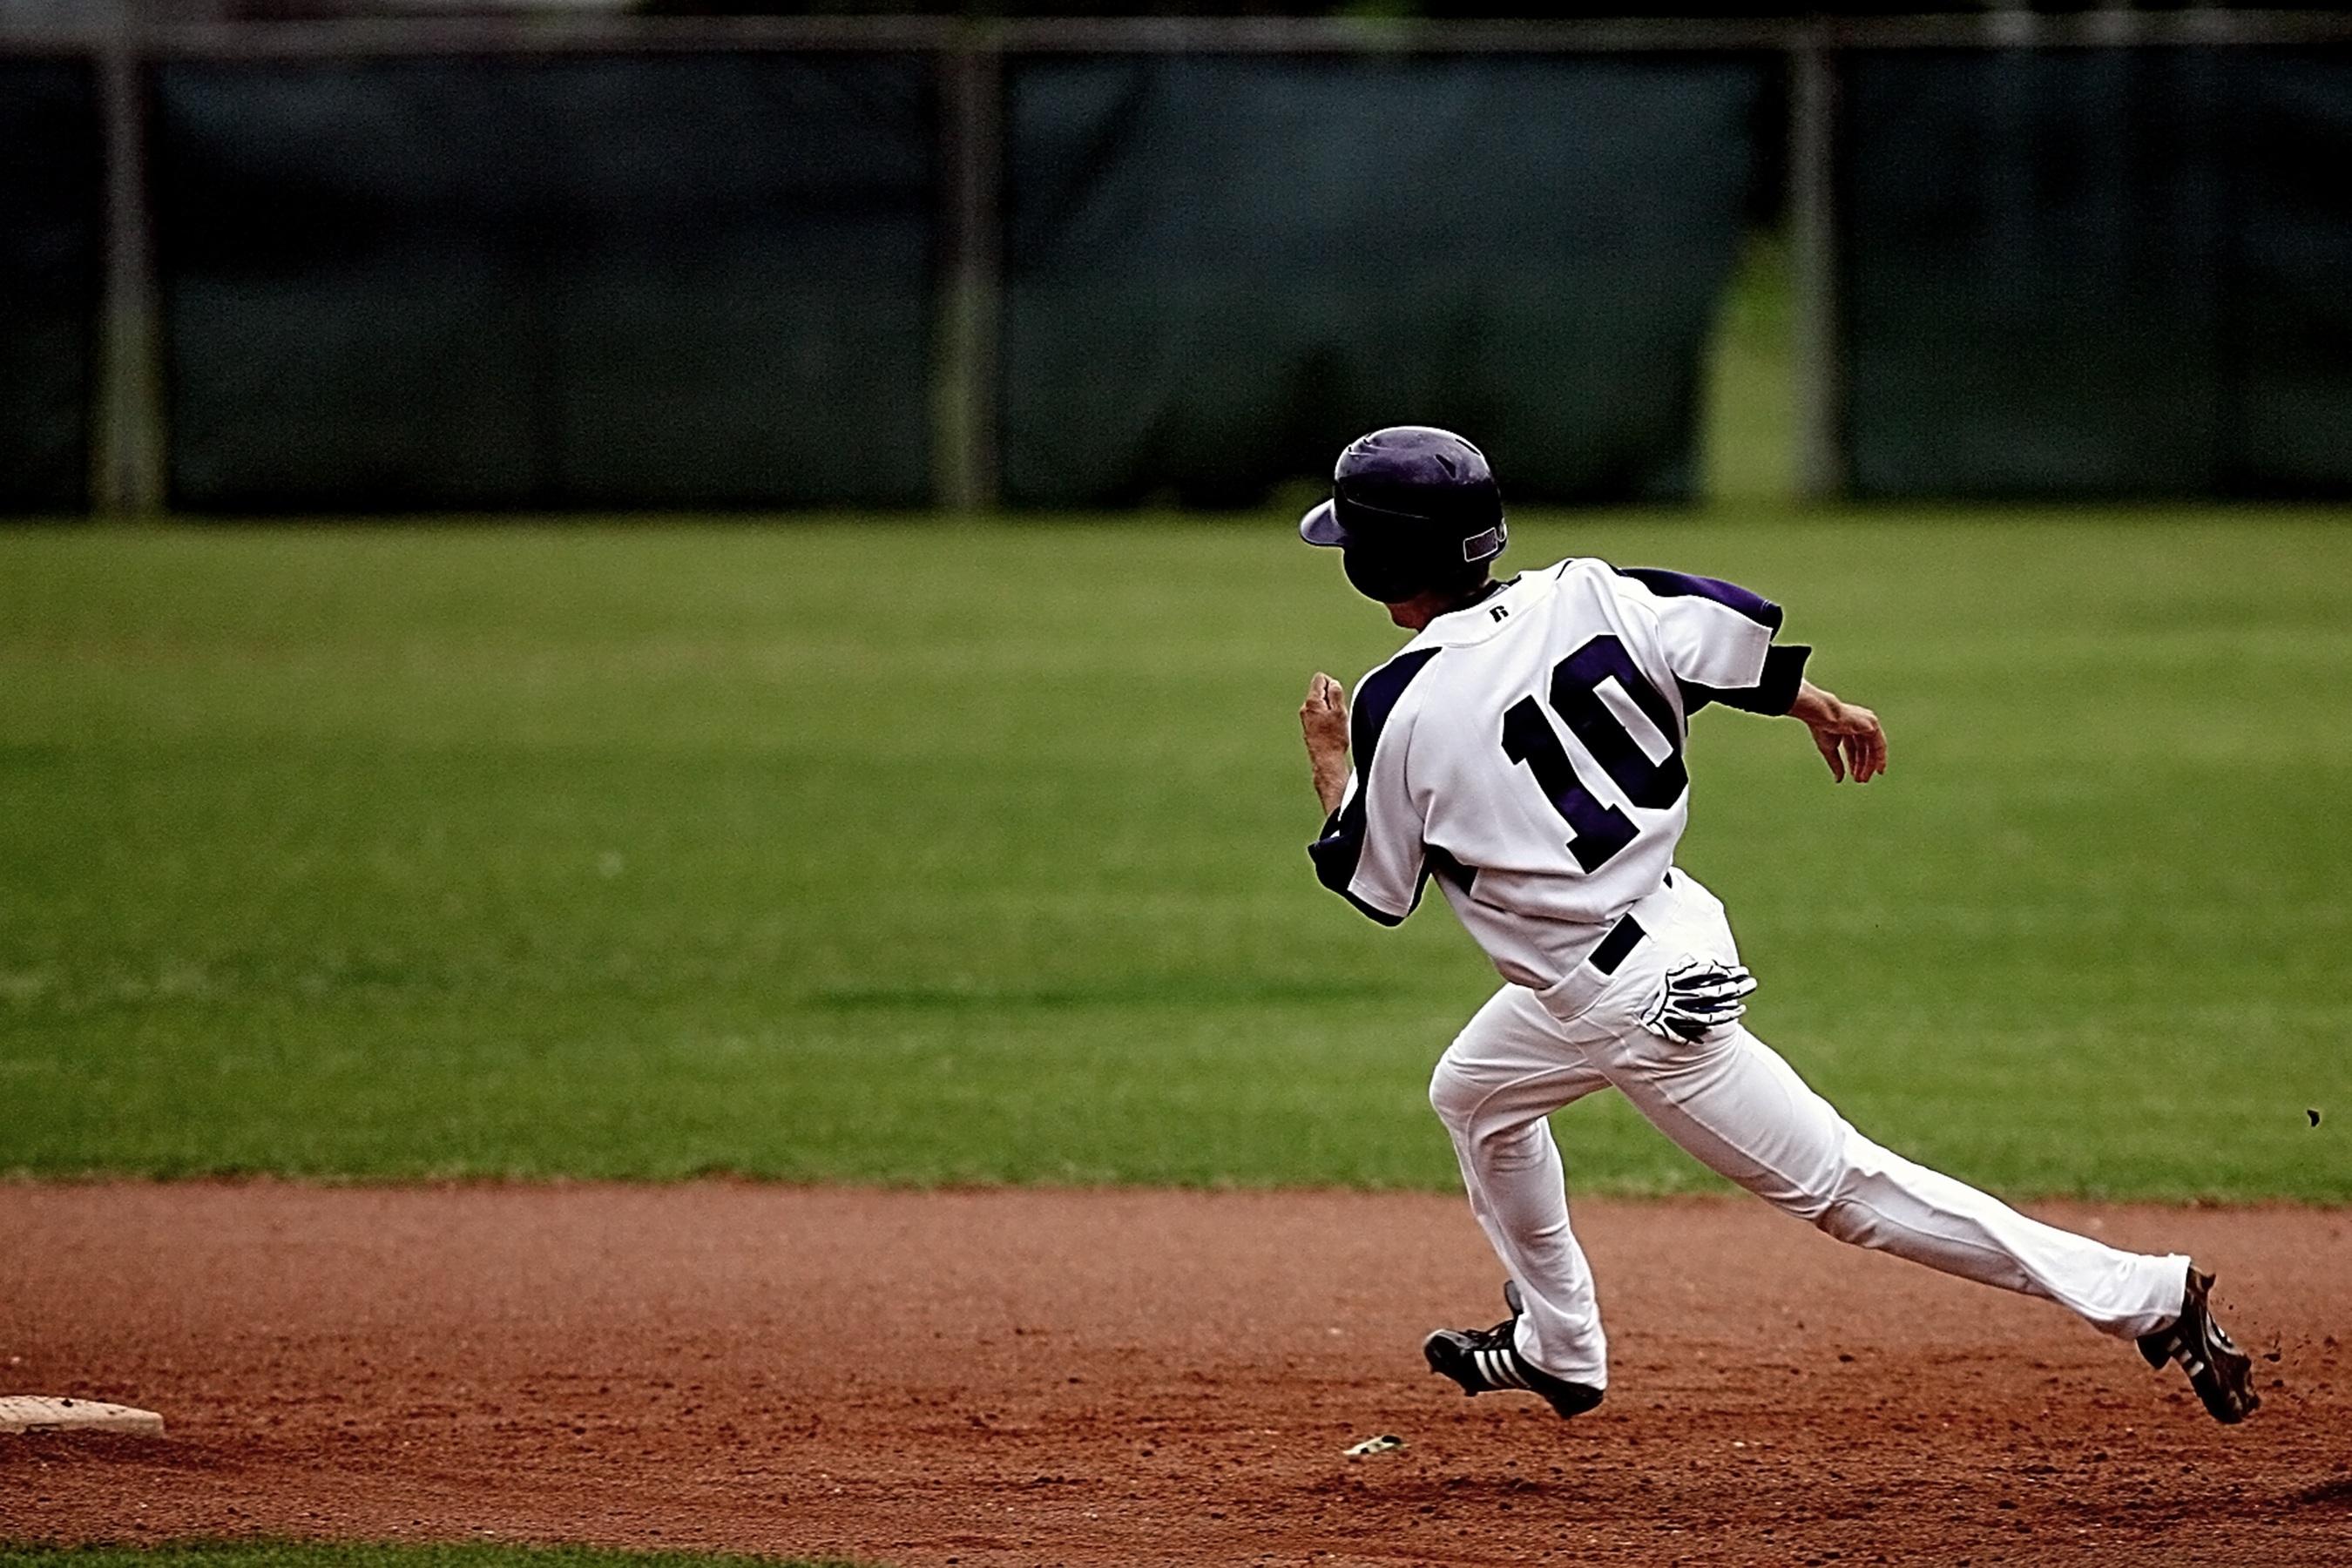 Baseball Player Running on Court